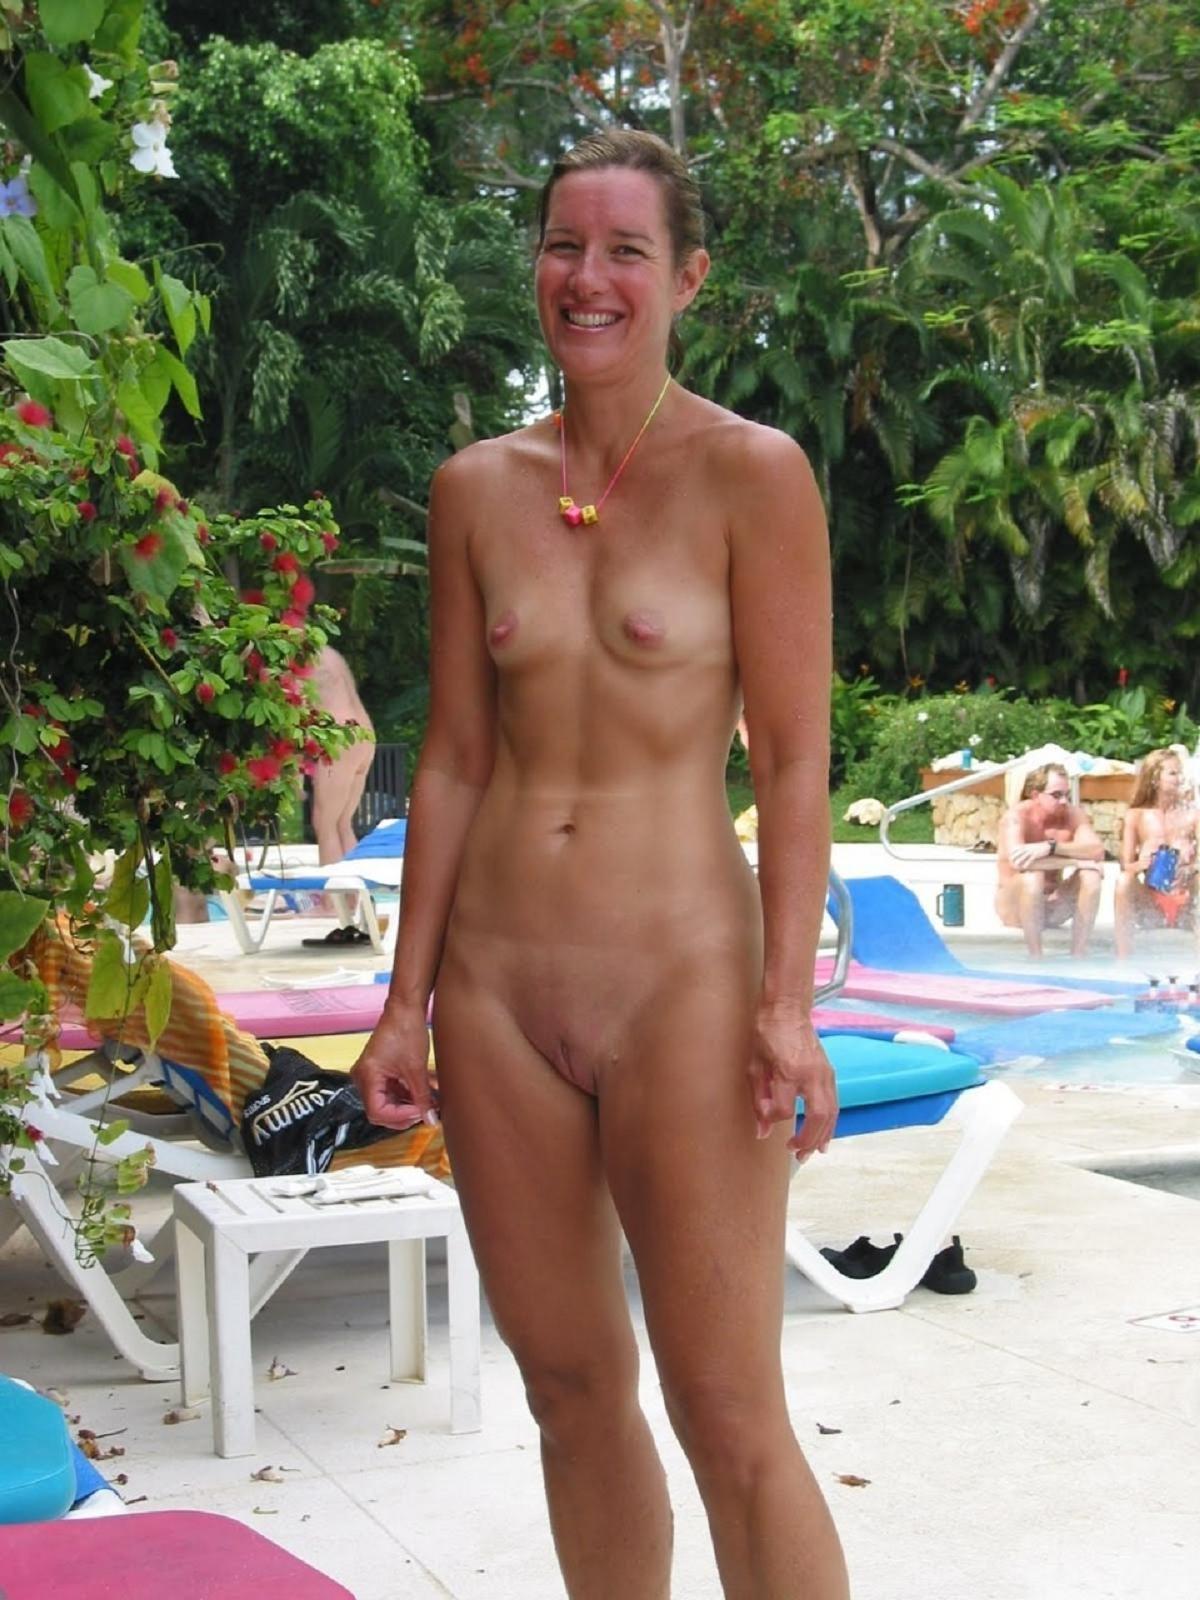 Nude beach voyeur video